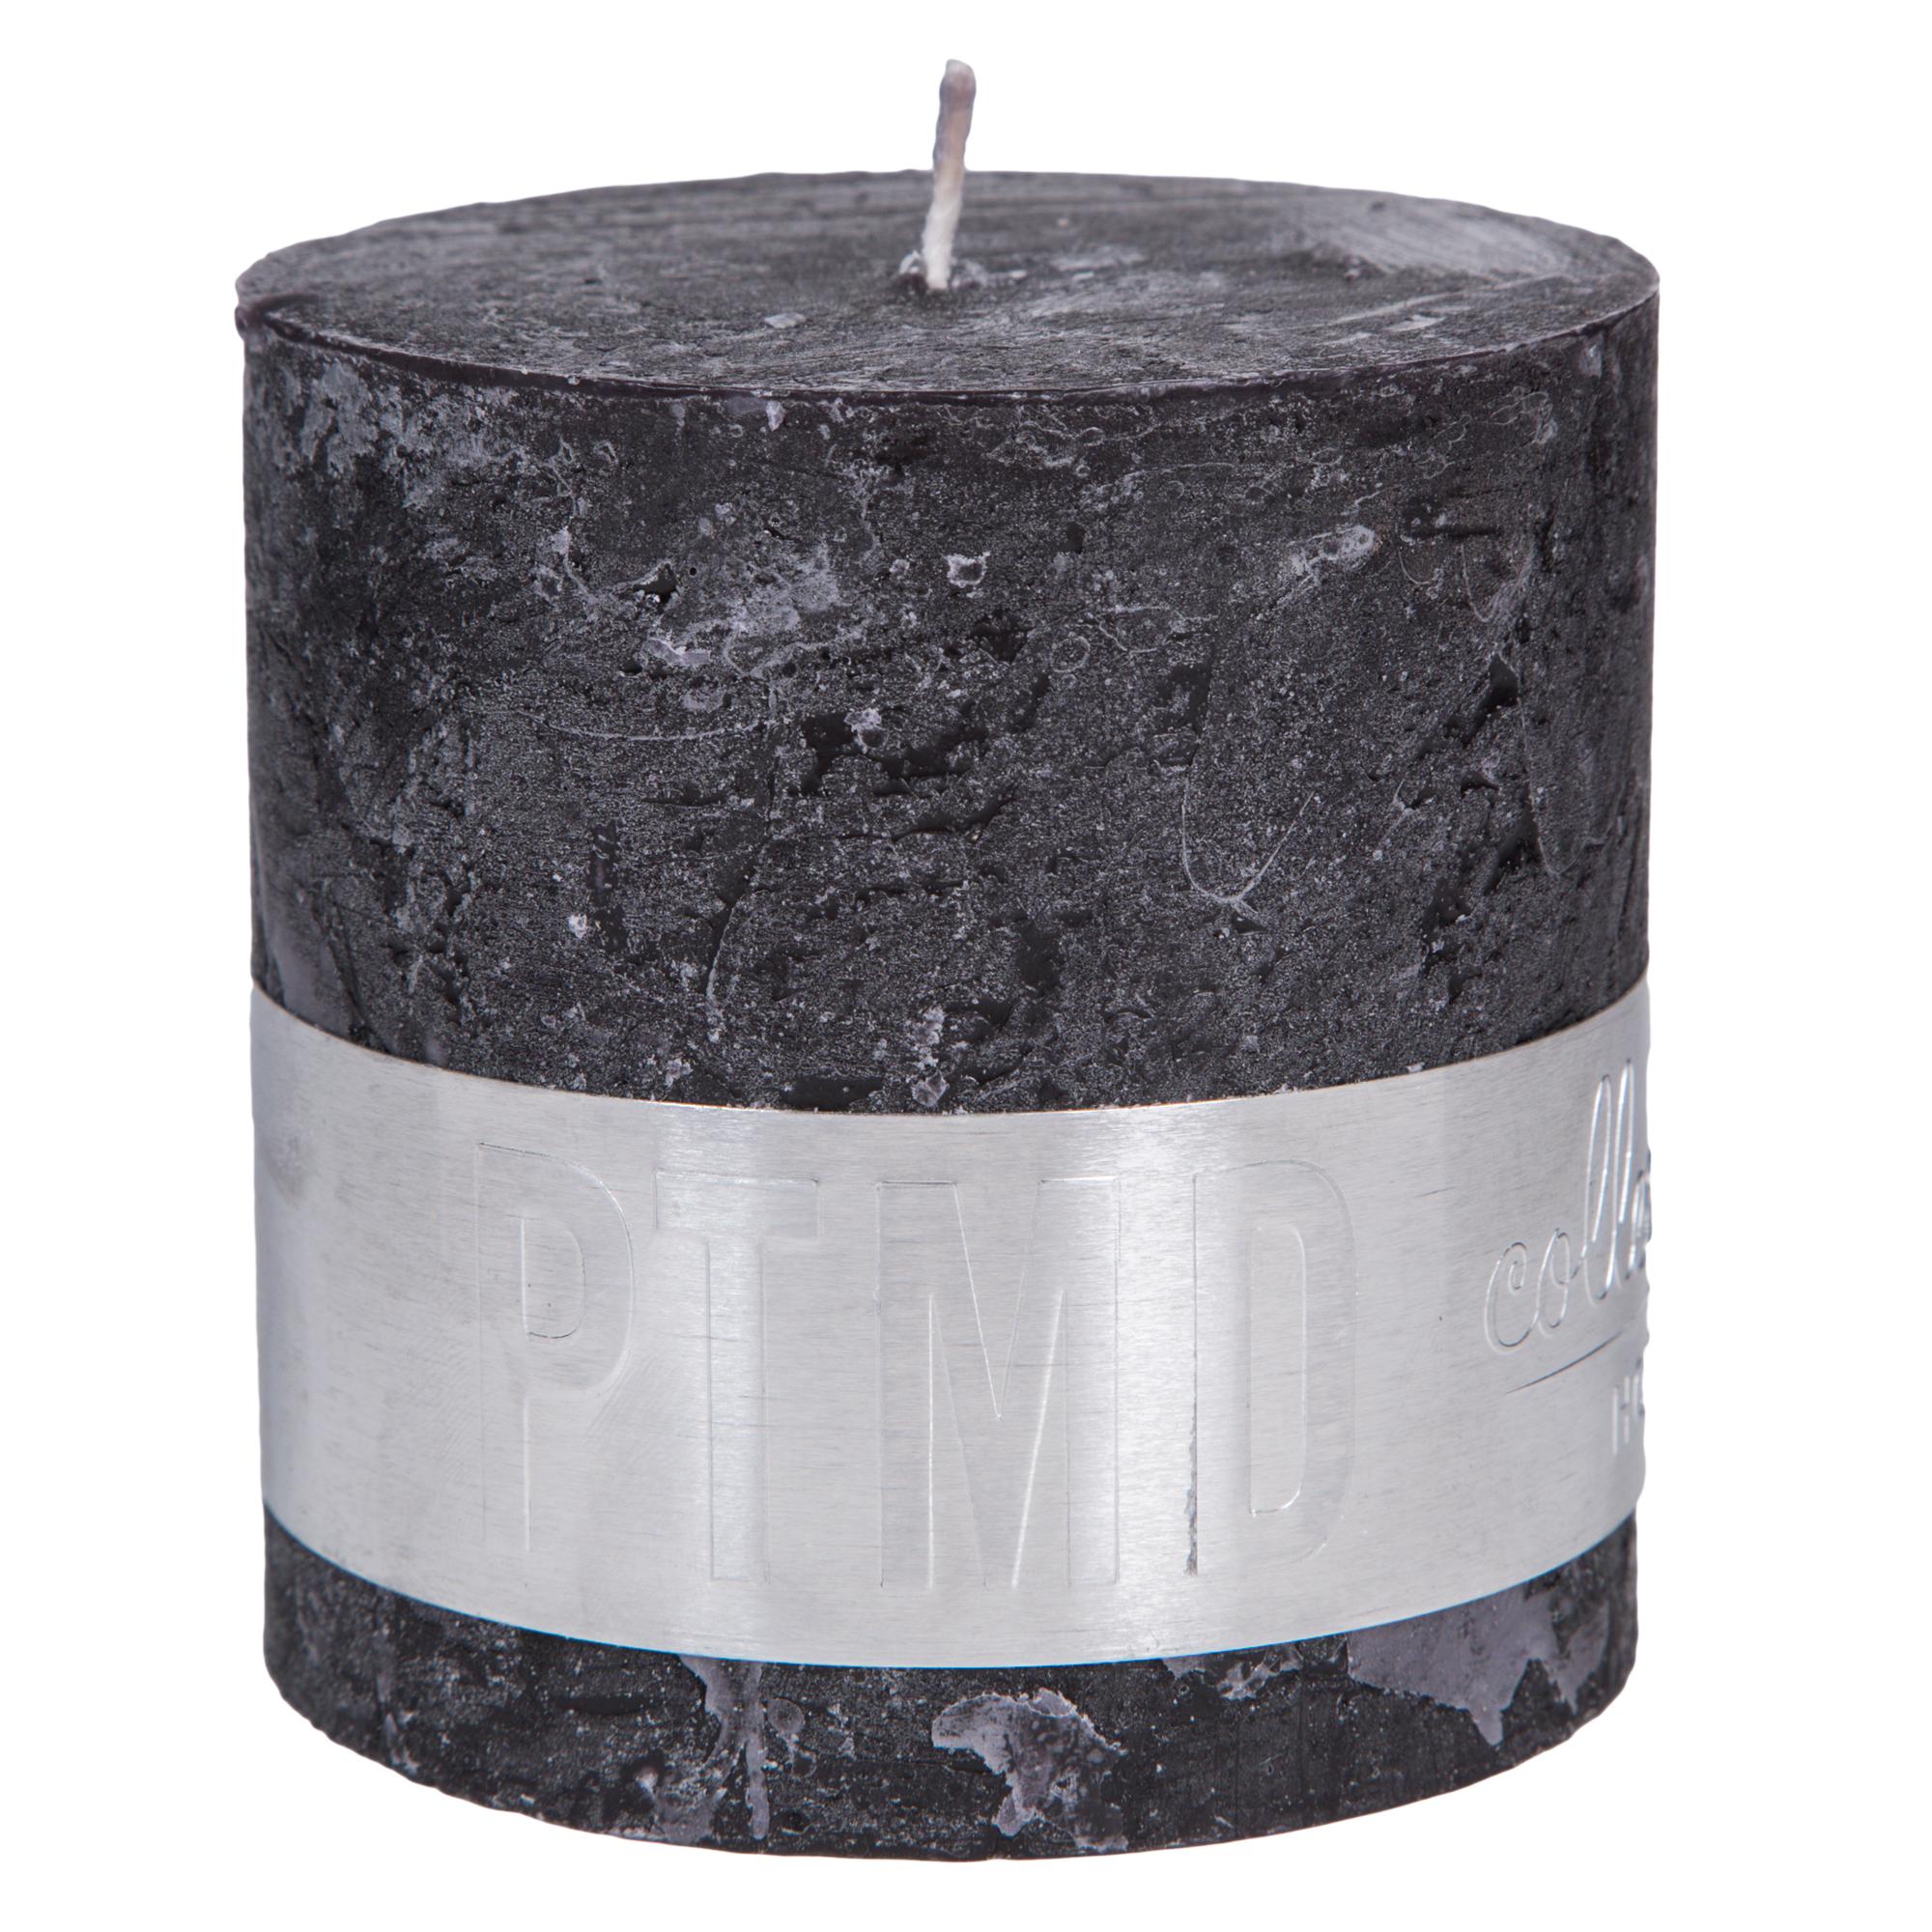 Rustic Kerze schwarz